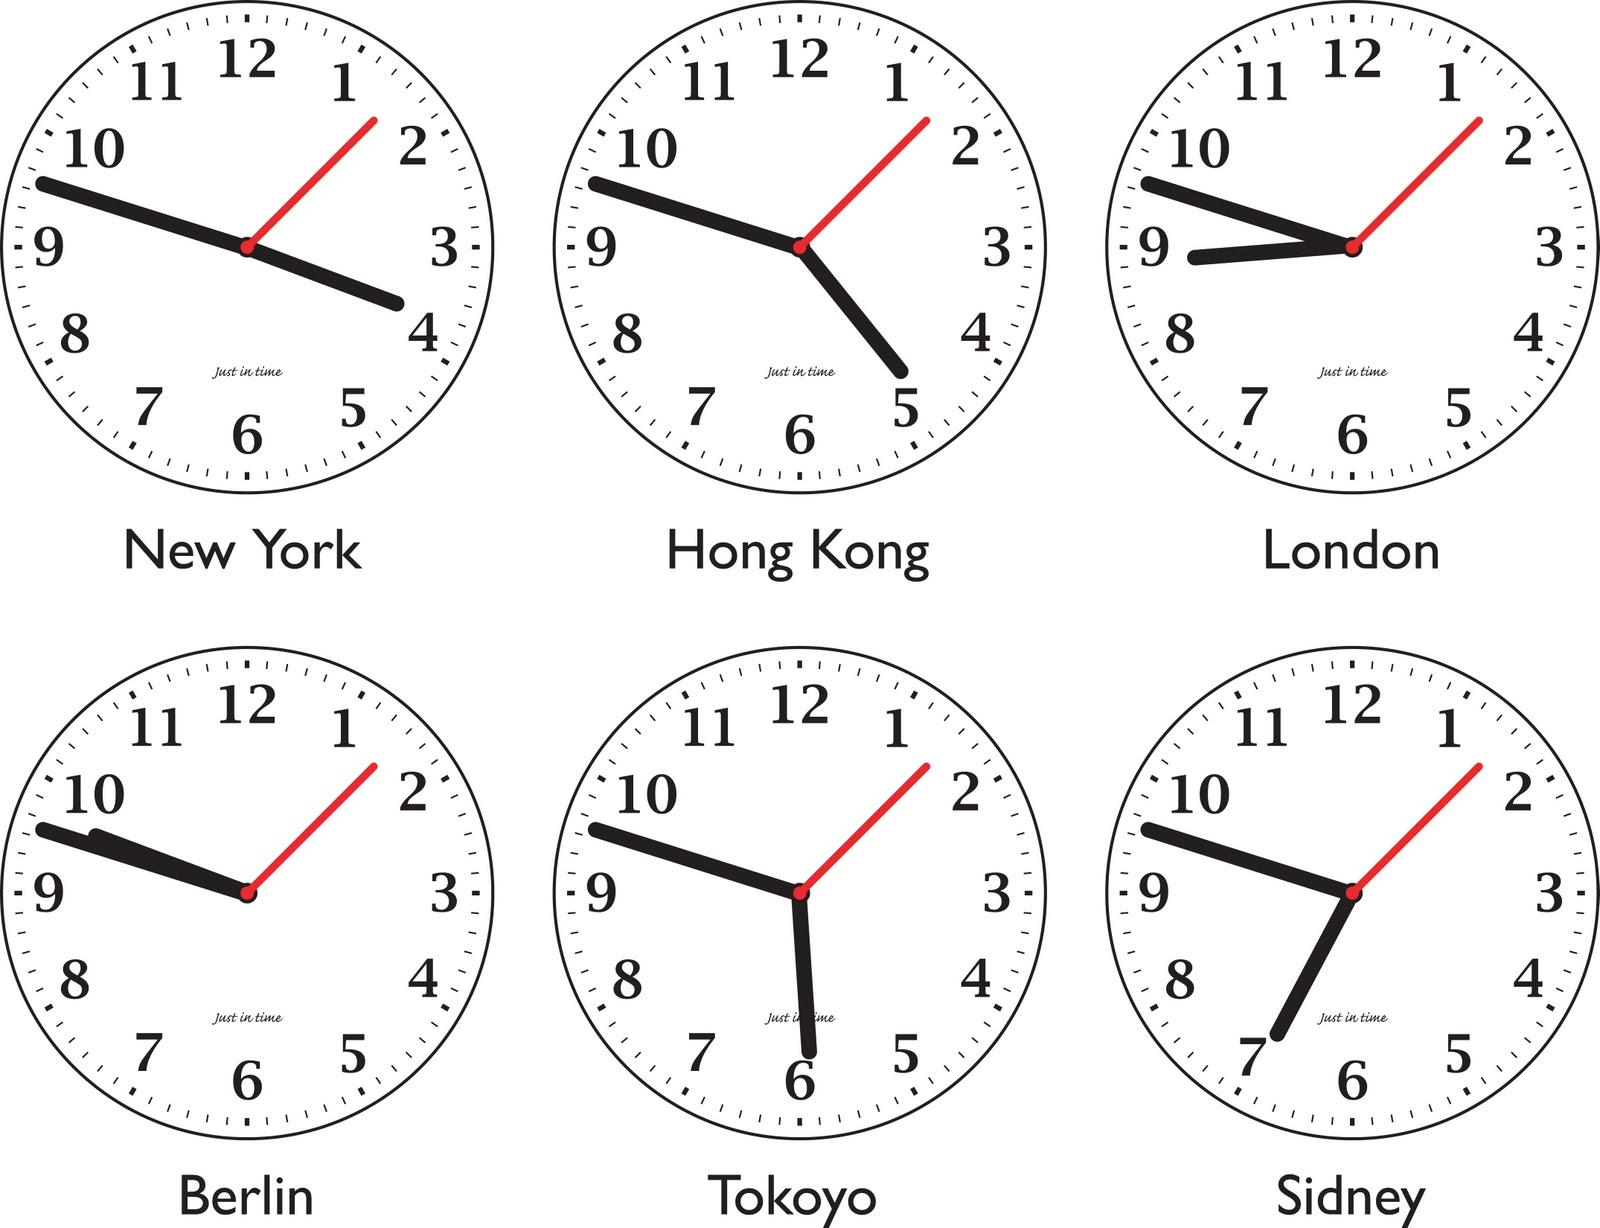 24 Hour Markets - Yuriy AnosovDecember 4, 2018